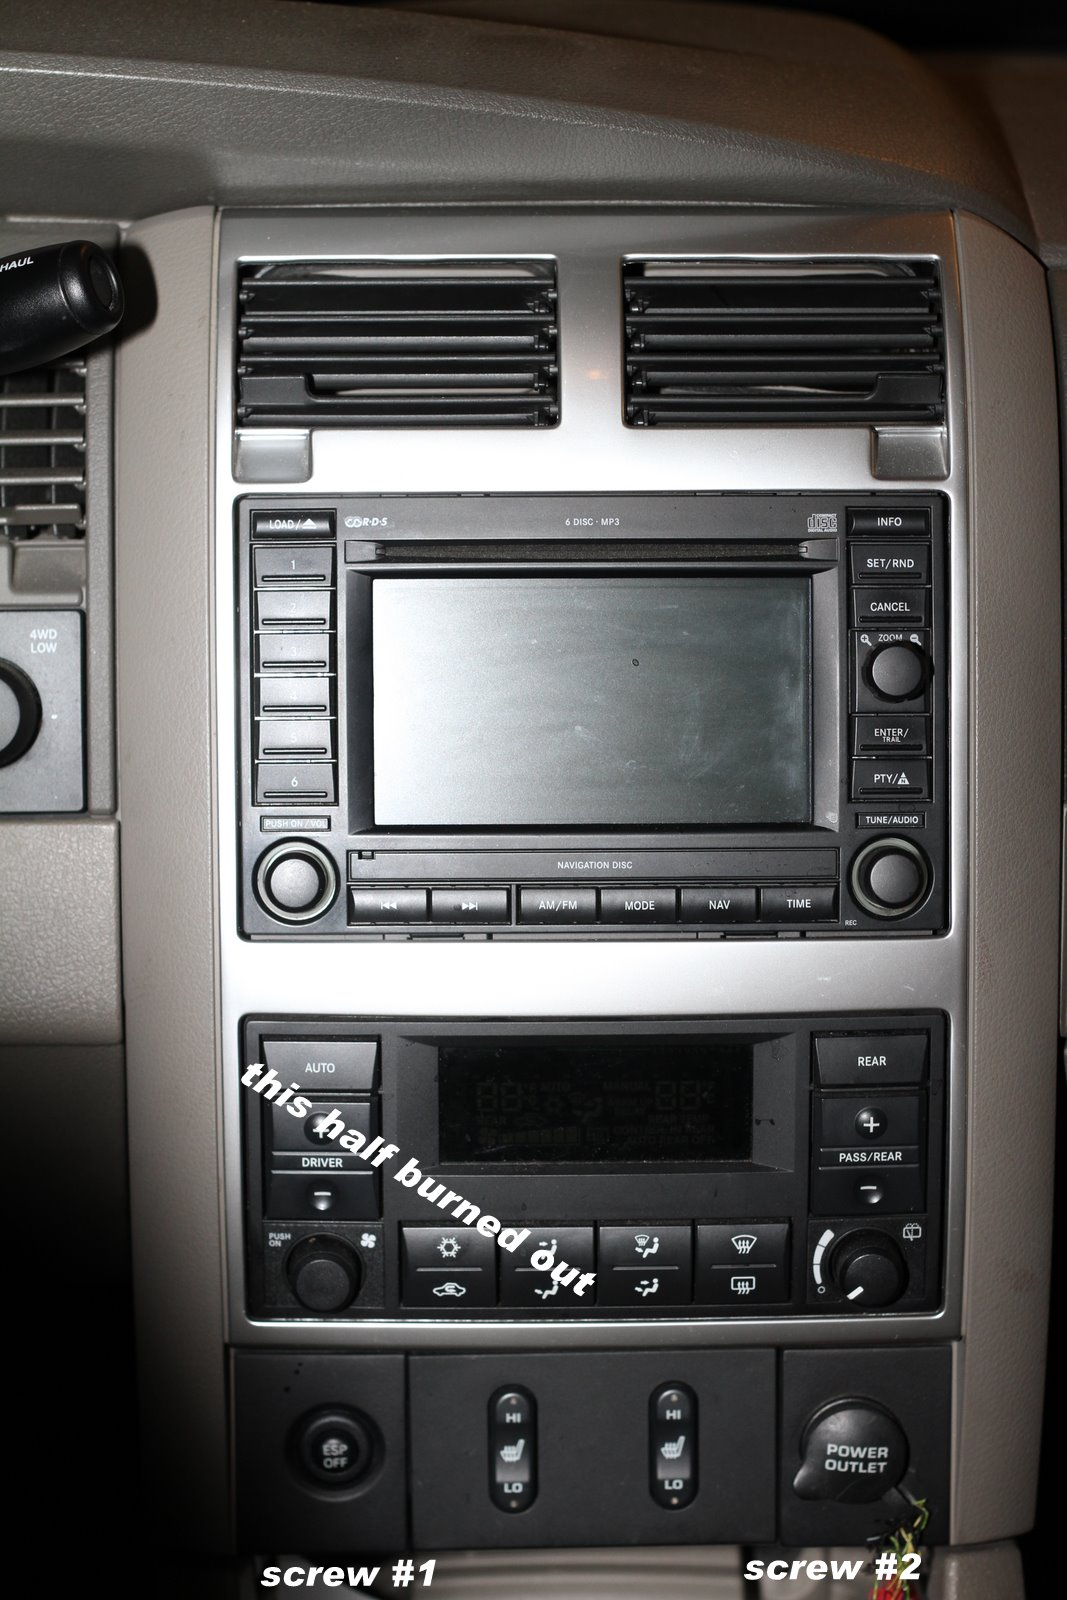 2007 Dodge Durango - Heater / AC Control Instrument Lights